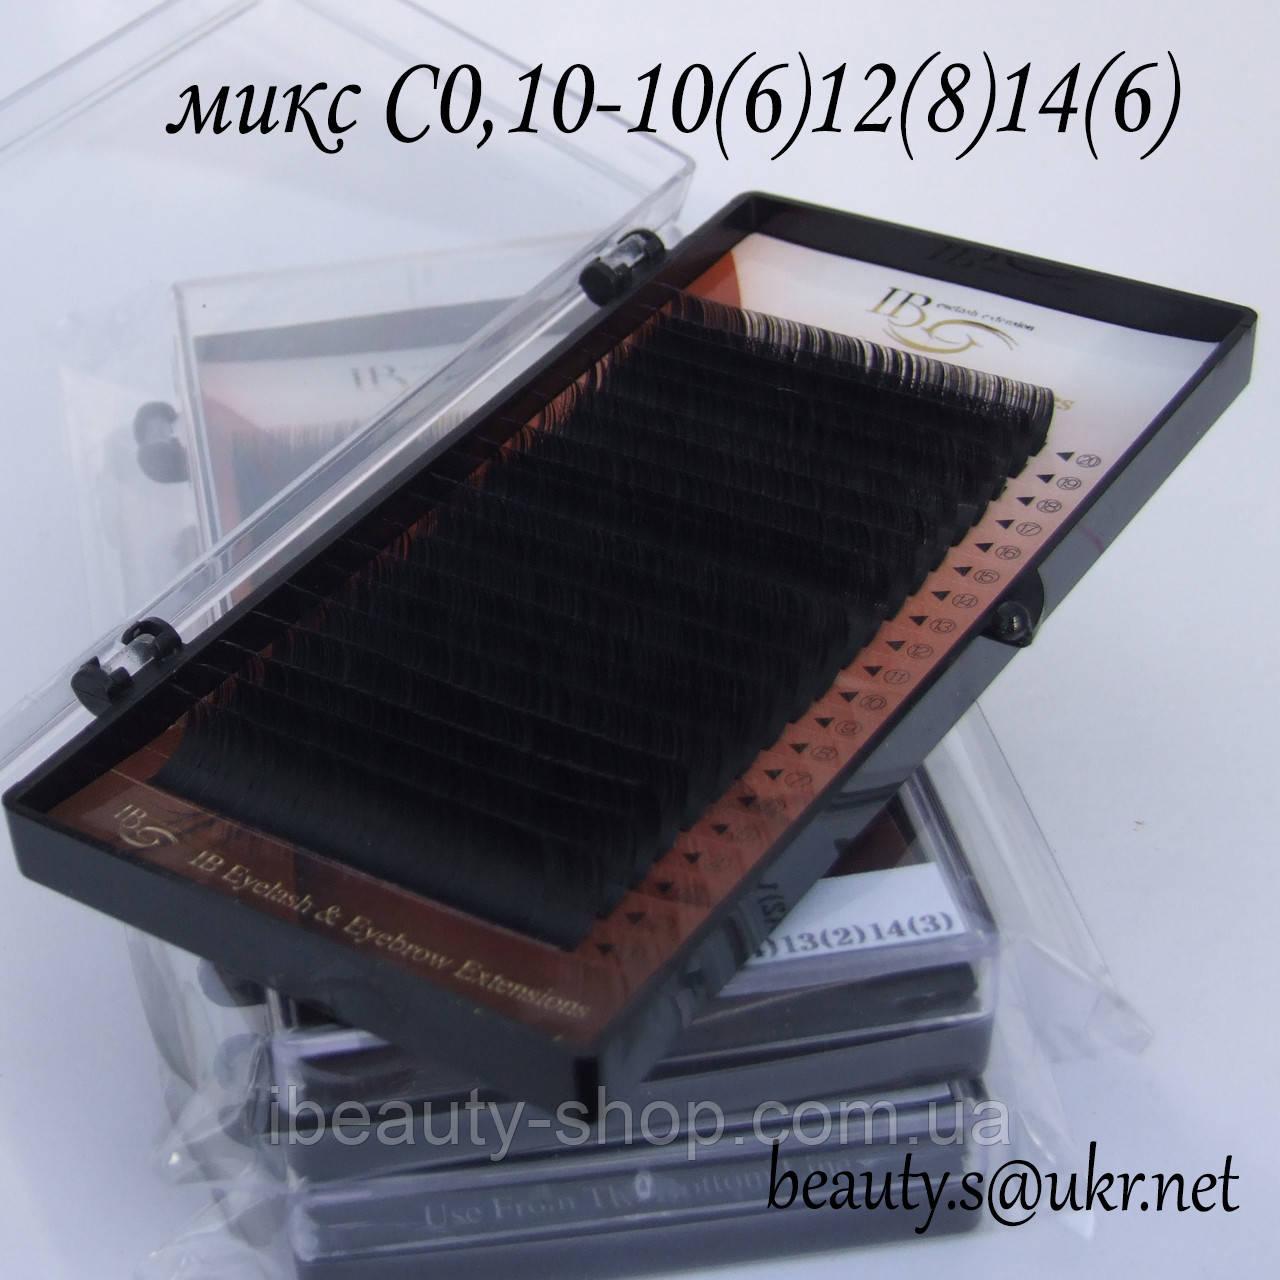 Ресницы I-Beauty микс С-0,10 10-12-14мм